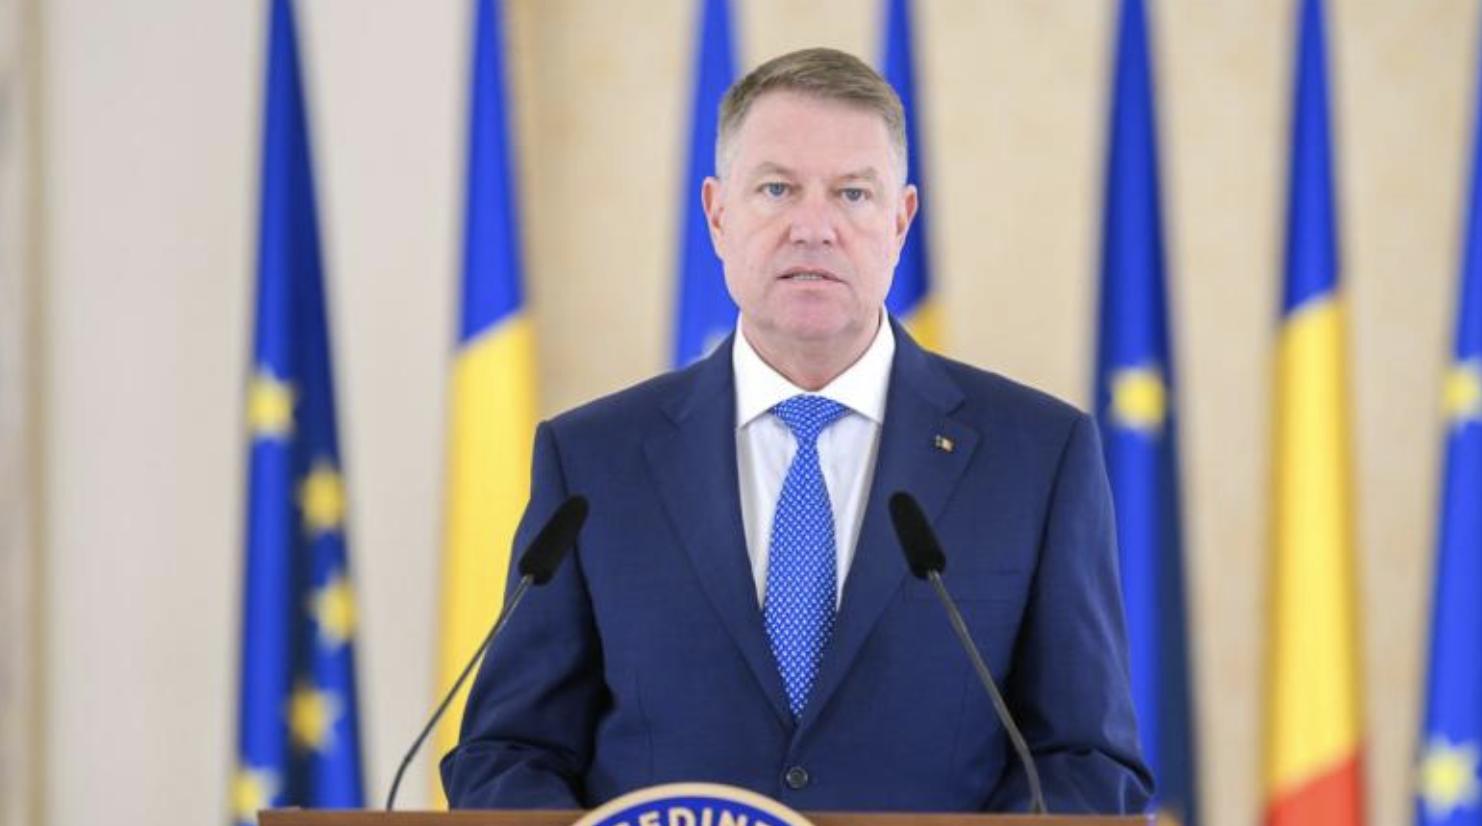 Romania: Iohannis to convene Supreme Defense Council on Ukraine